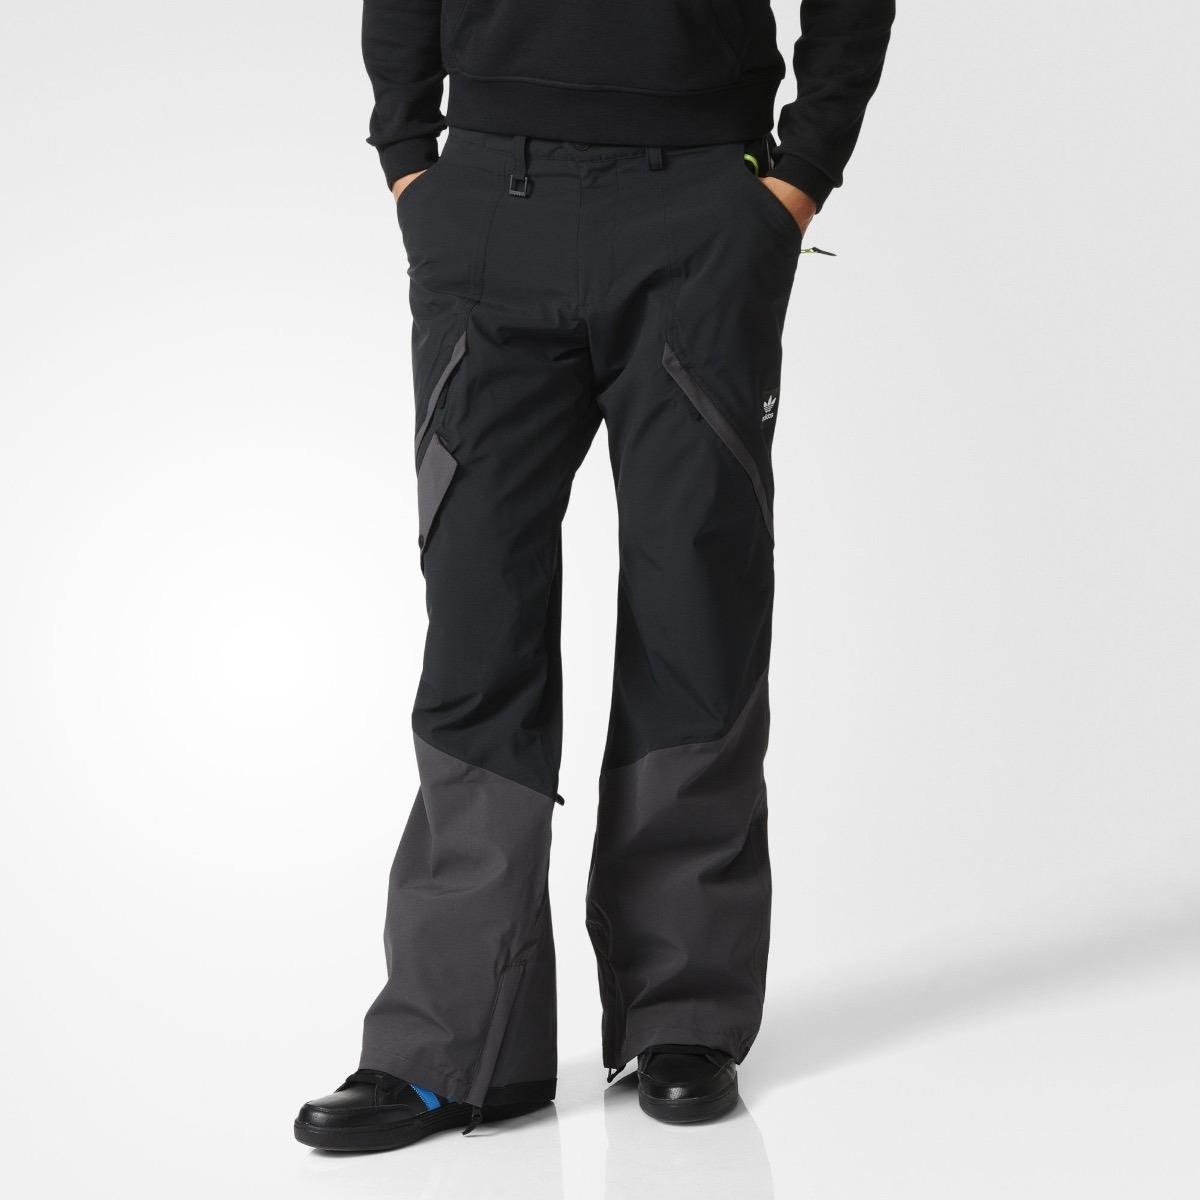 8007c309f0c21 pantalón adidas impermeable snowboardin nieve hombre talla l. Cargando zoom.